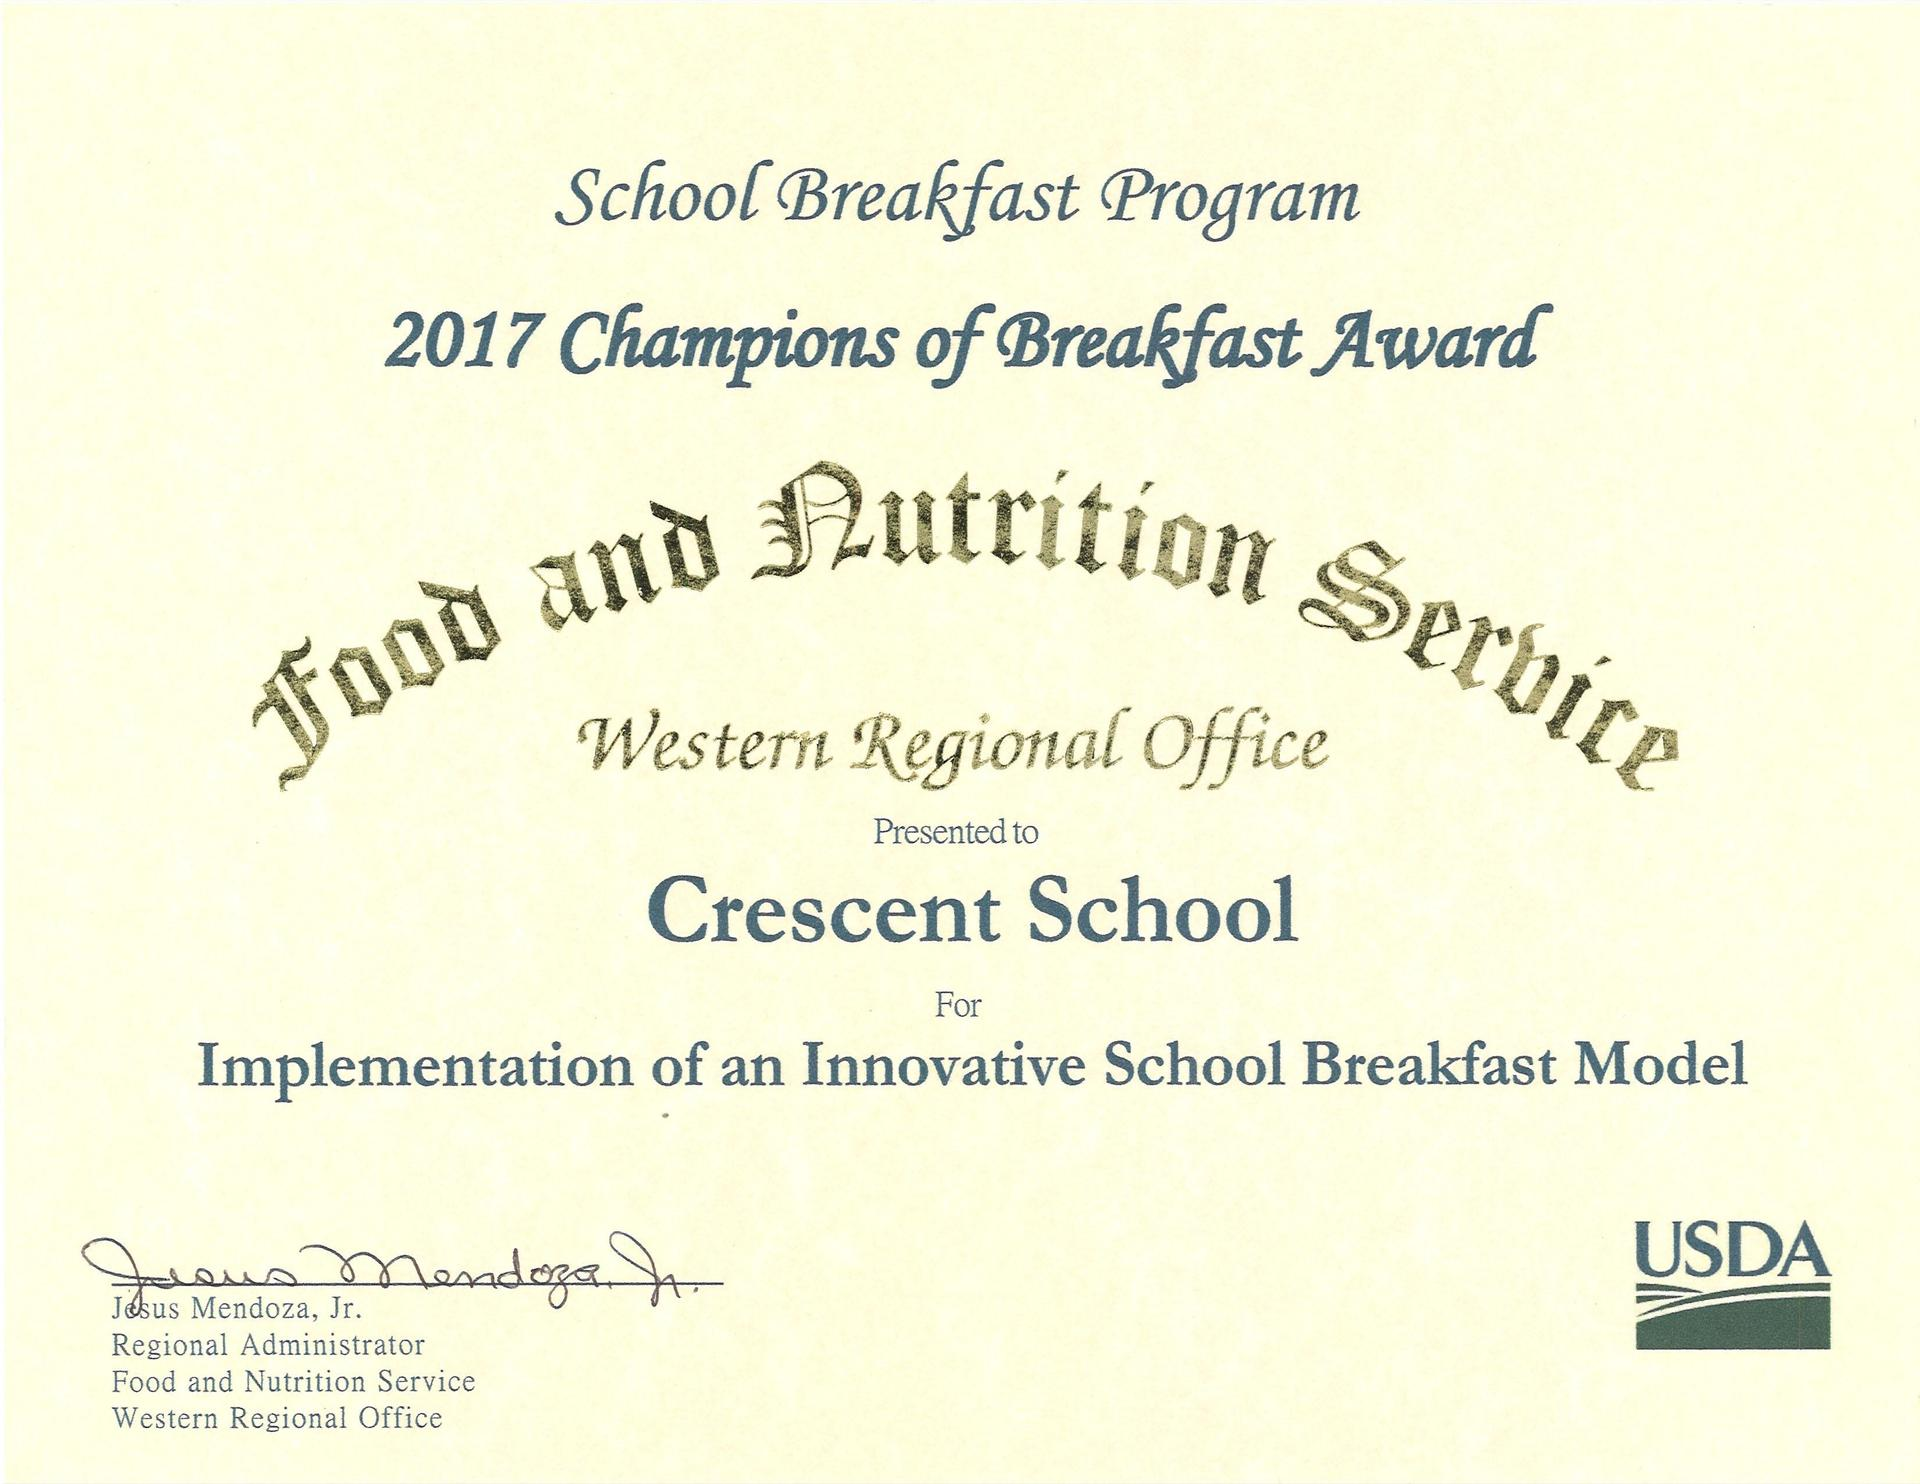 2017 Champion of Breakfast Award